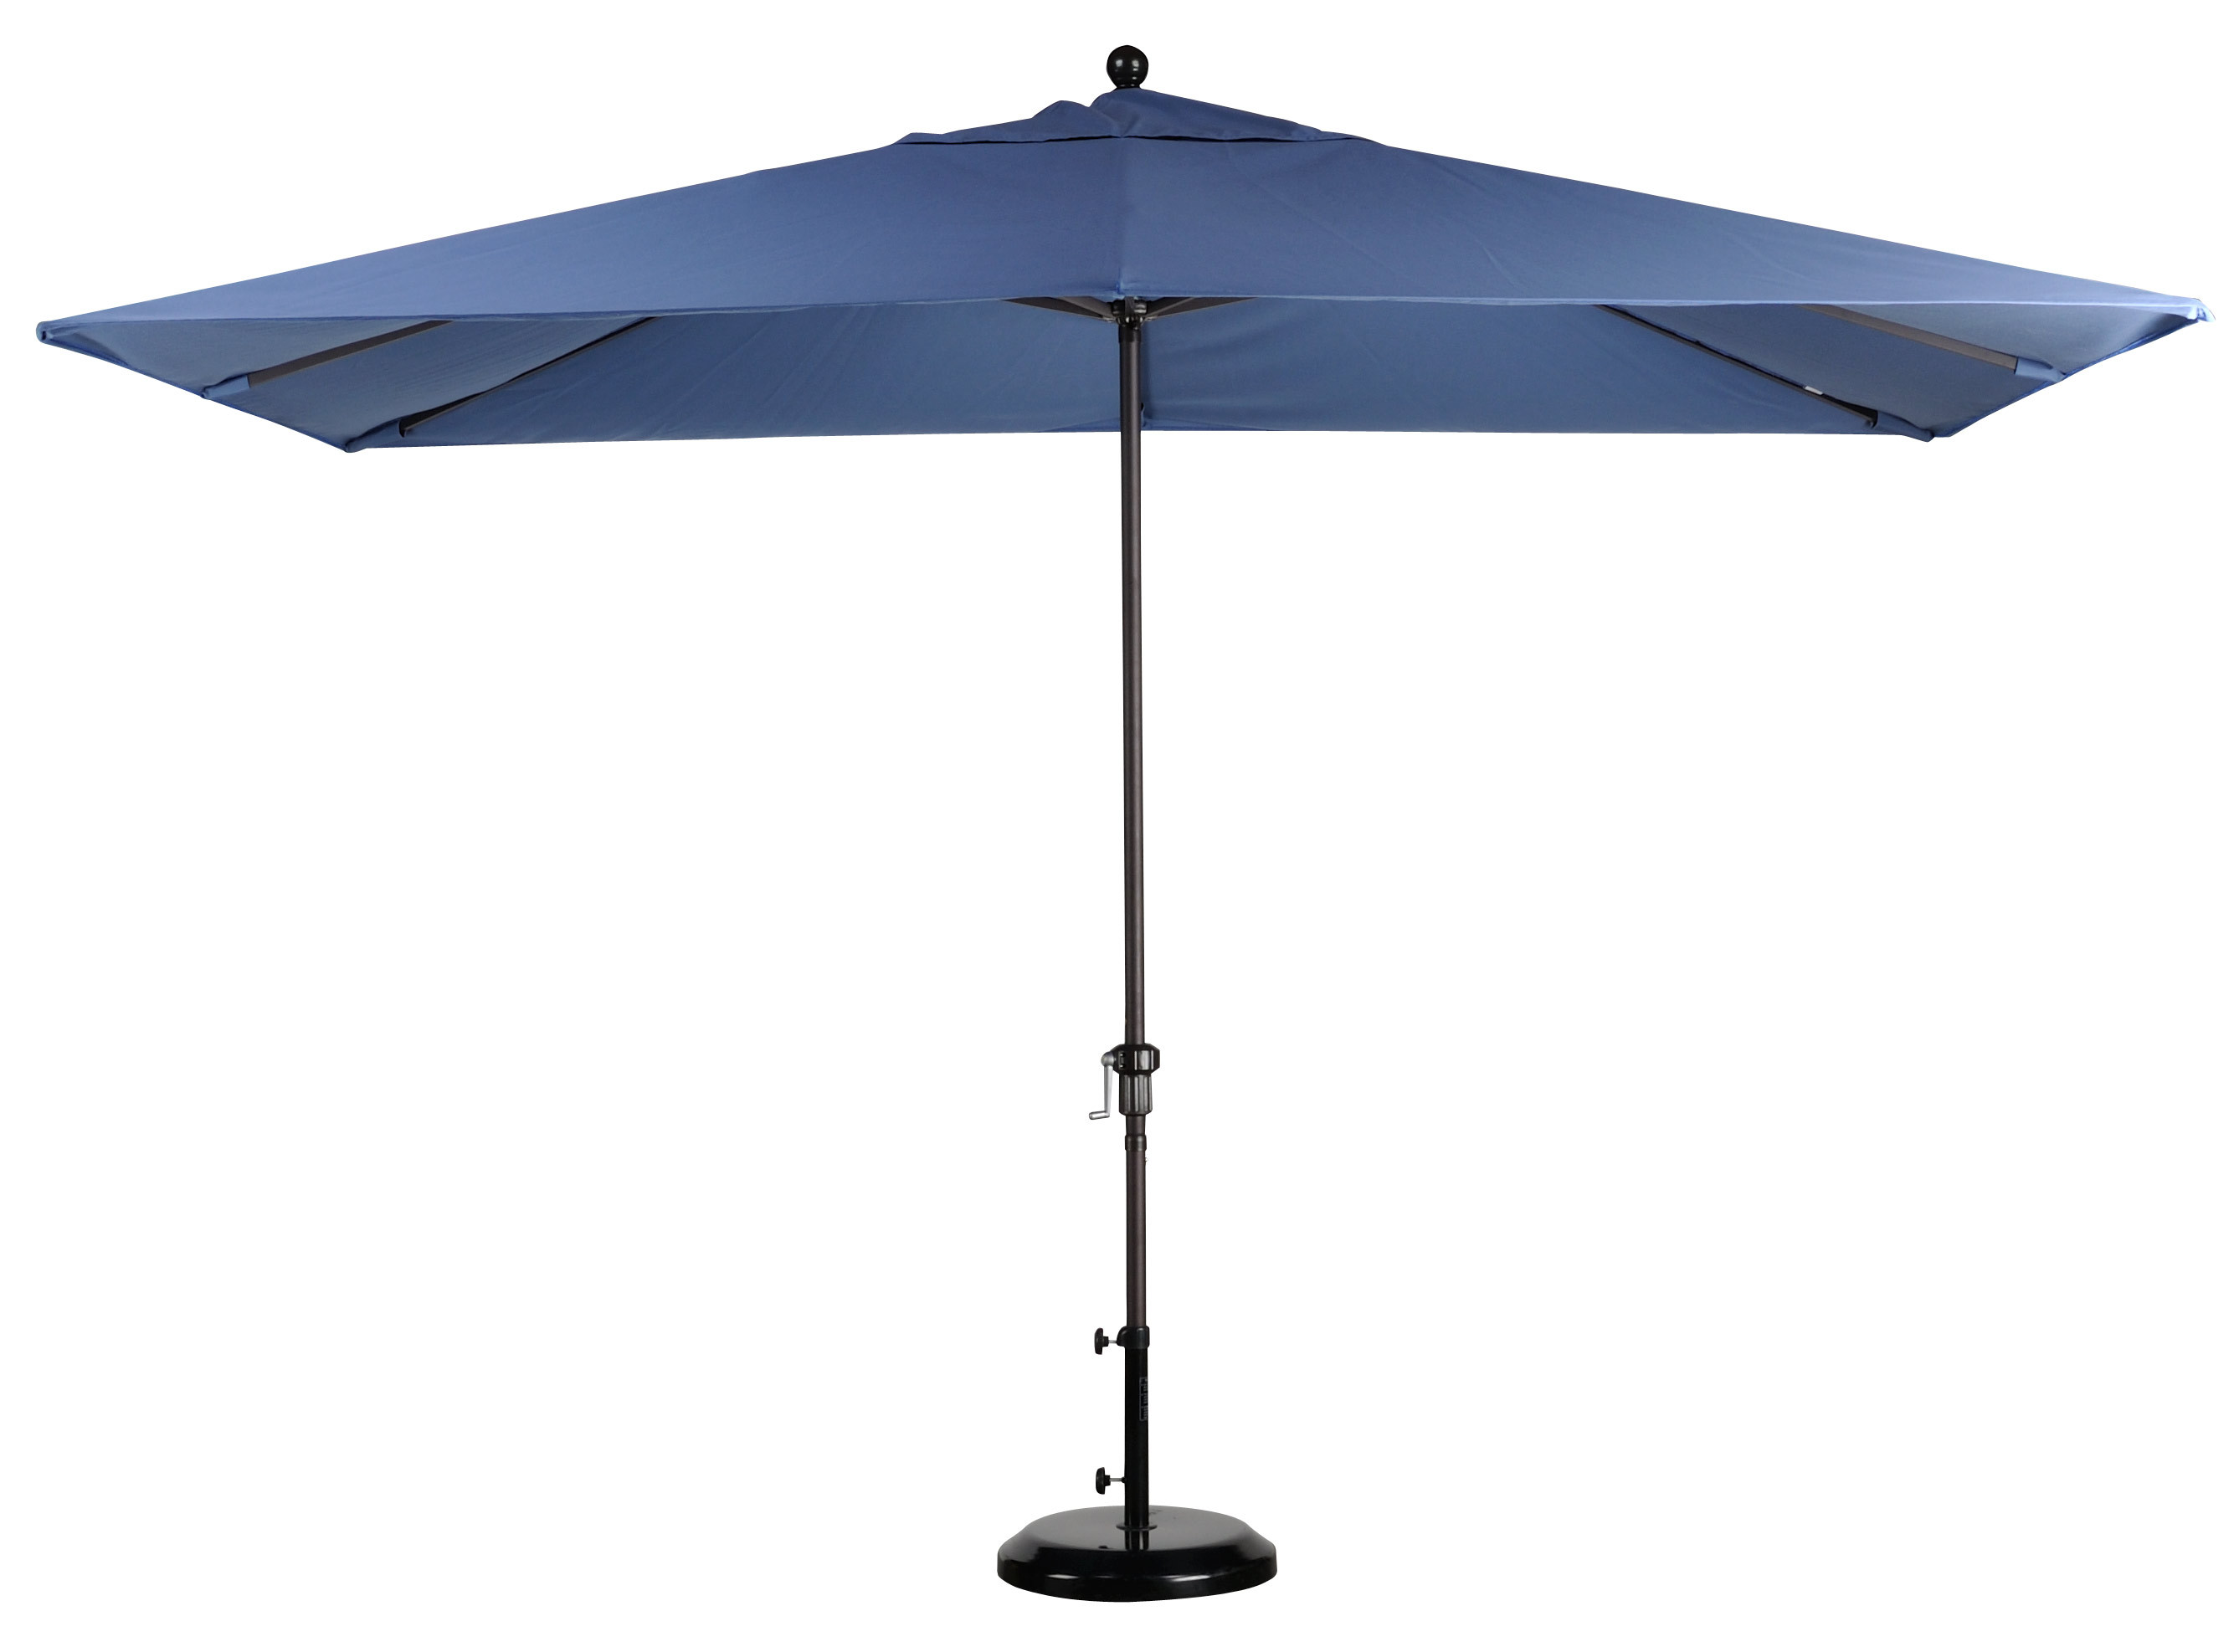 Best ideas about Sunbrella Patio Umbrellas . Save or Pin Sunbrella Umbrellas Now.